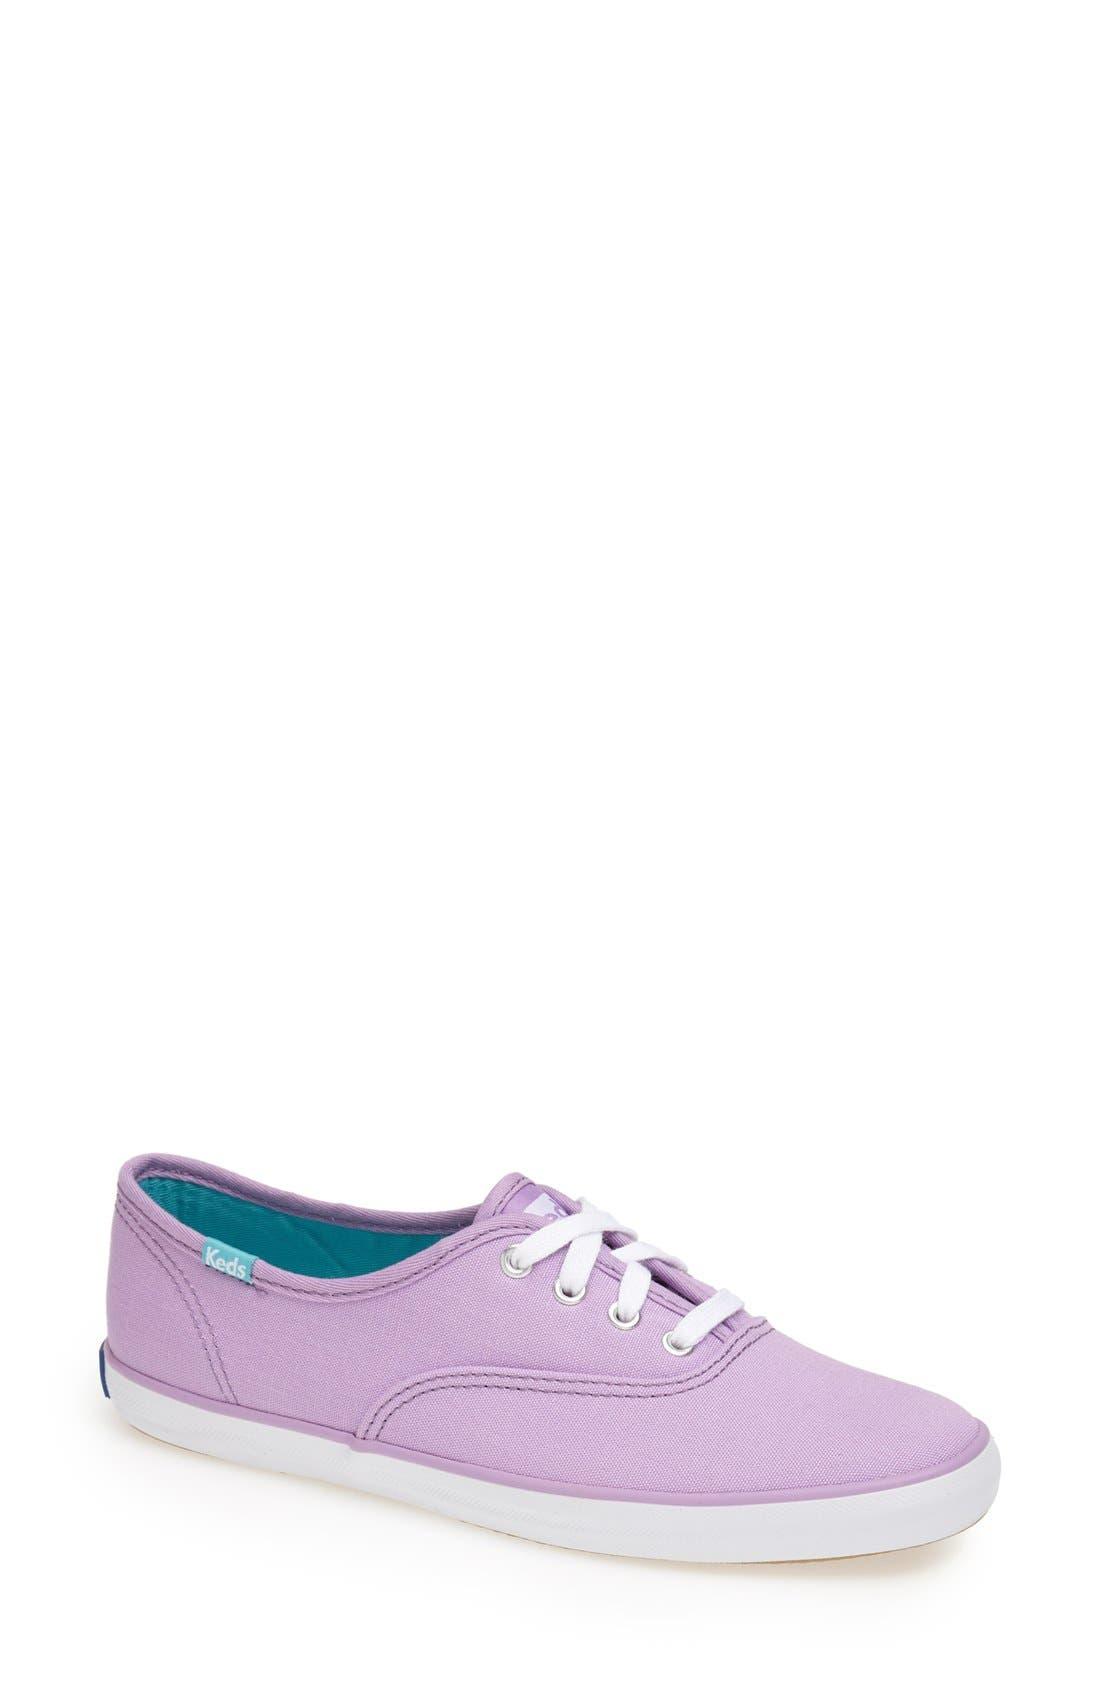 Alternate Image 1 Selected - Keds® 'Champion' Sneaker (Women)